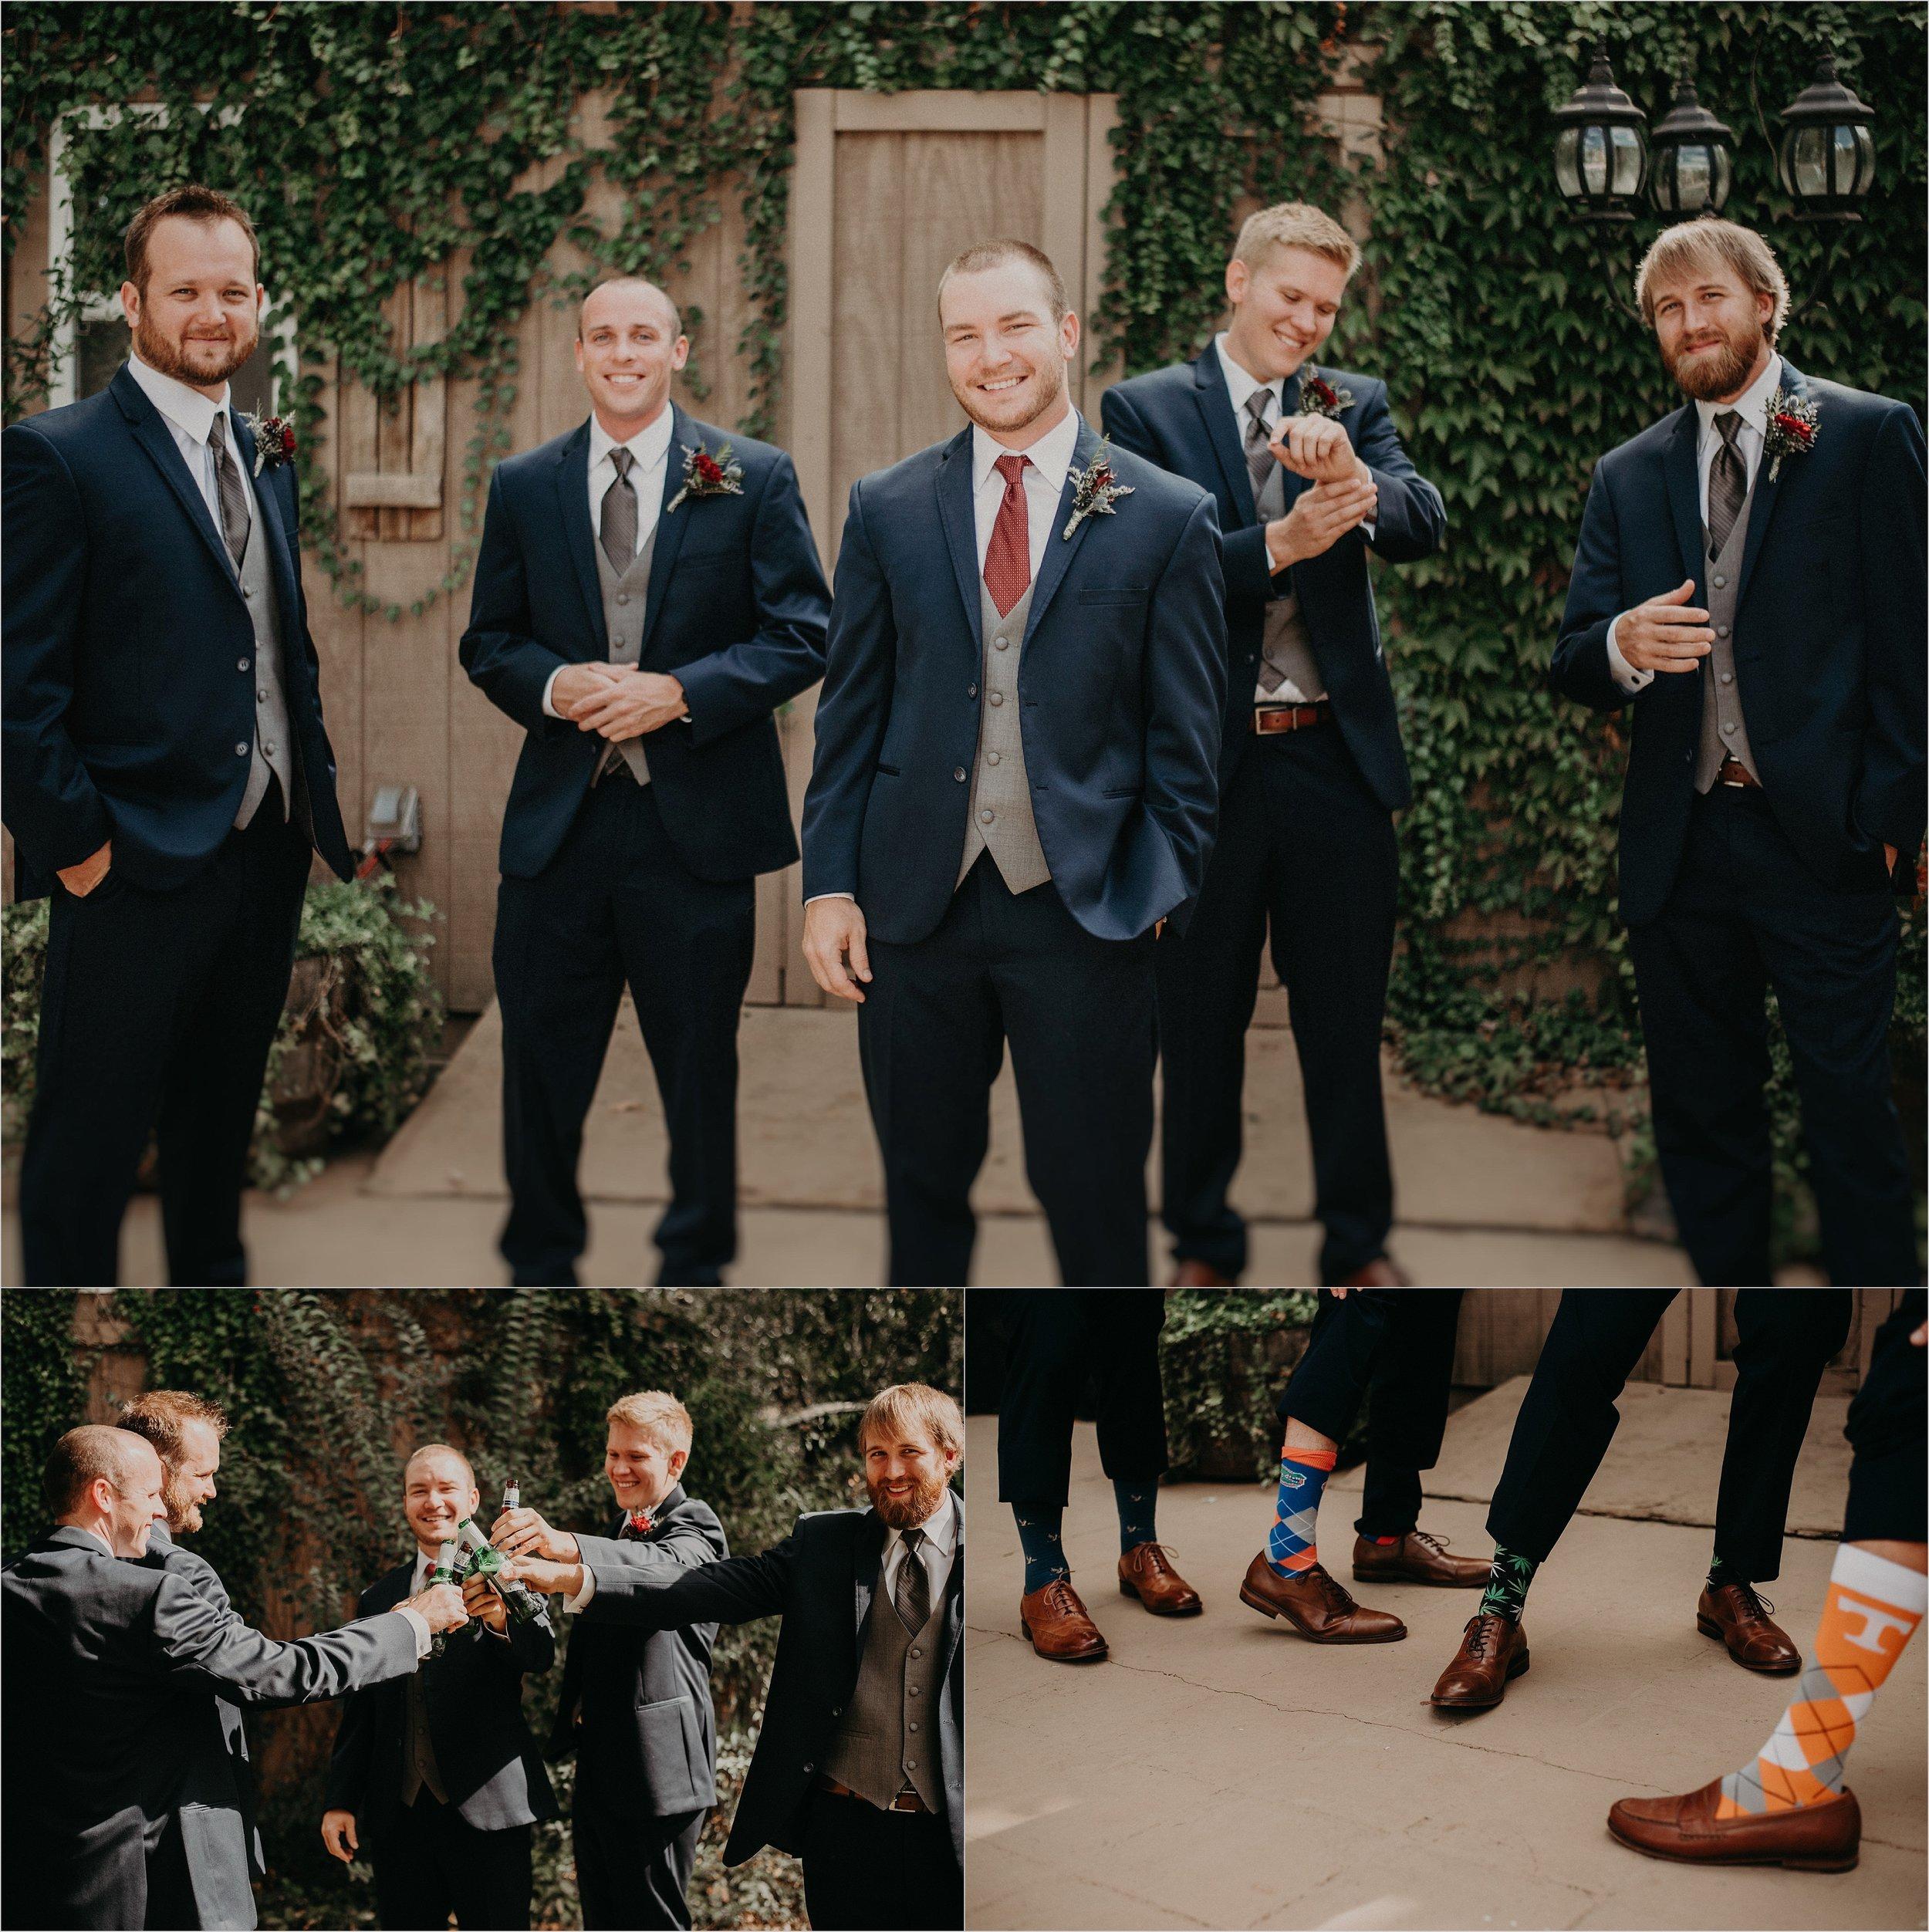 Groomsmen goof off before wedding ceremony